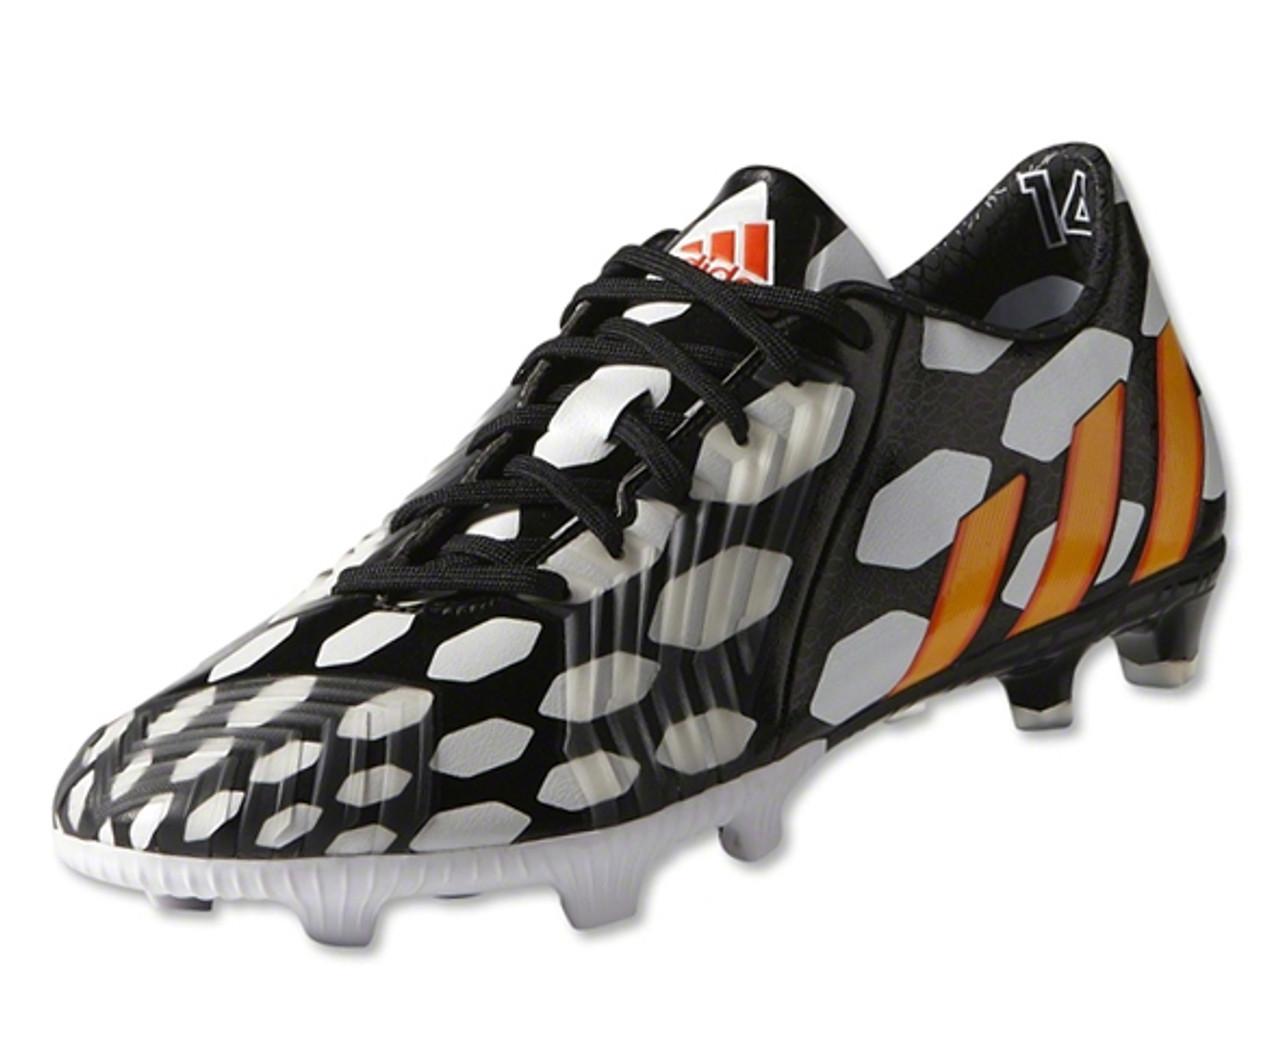 a9428ee777c4 adidas Predator Absolion Instinct FG - Black Running White SD (7718) - ohp  soccer